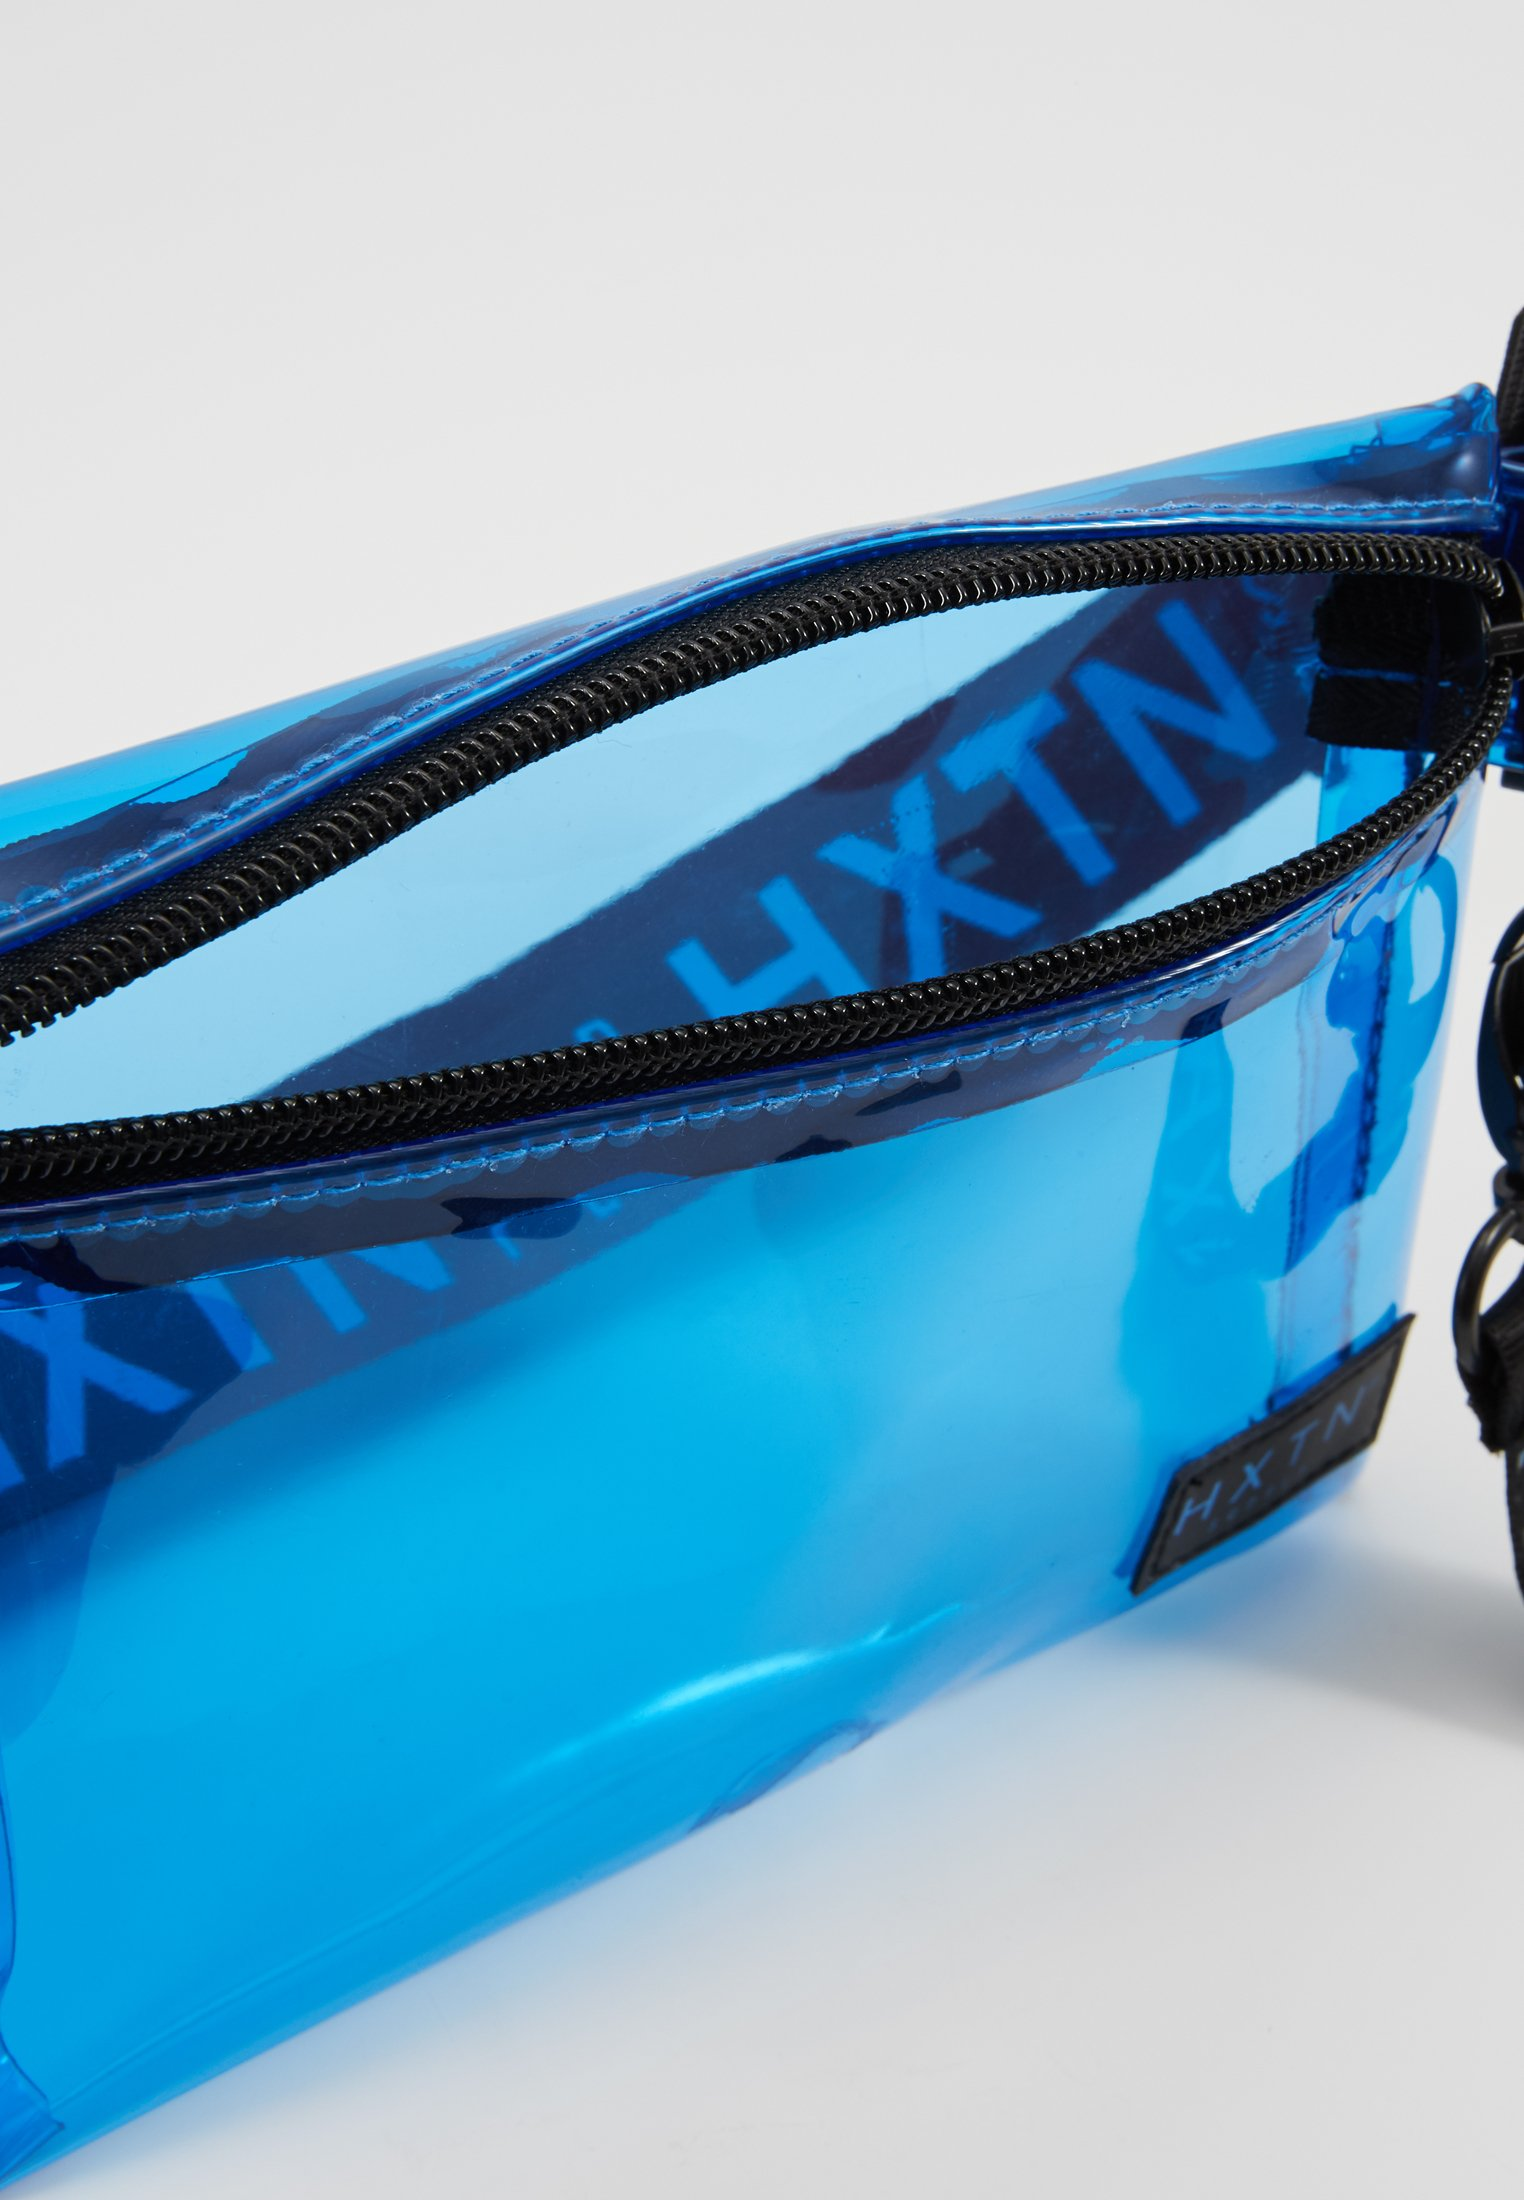 CrossbodySac Hxtn Supply Banane Prime Blue q5jc3RLS4A